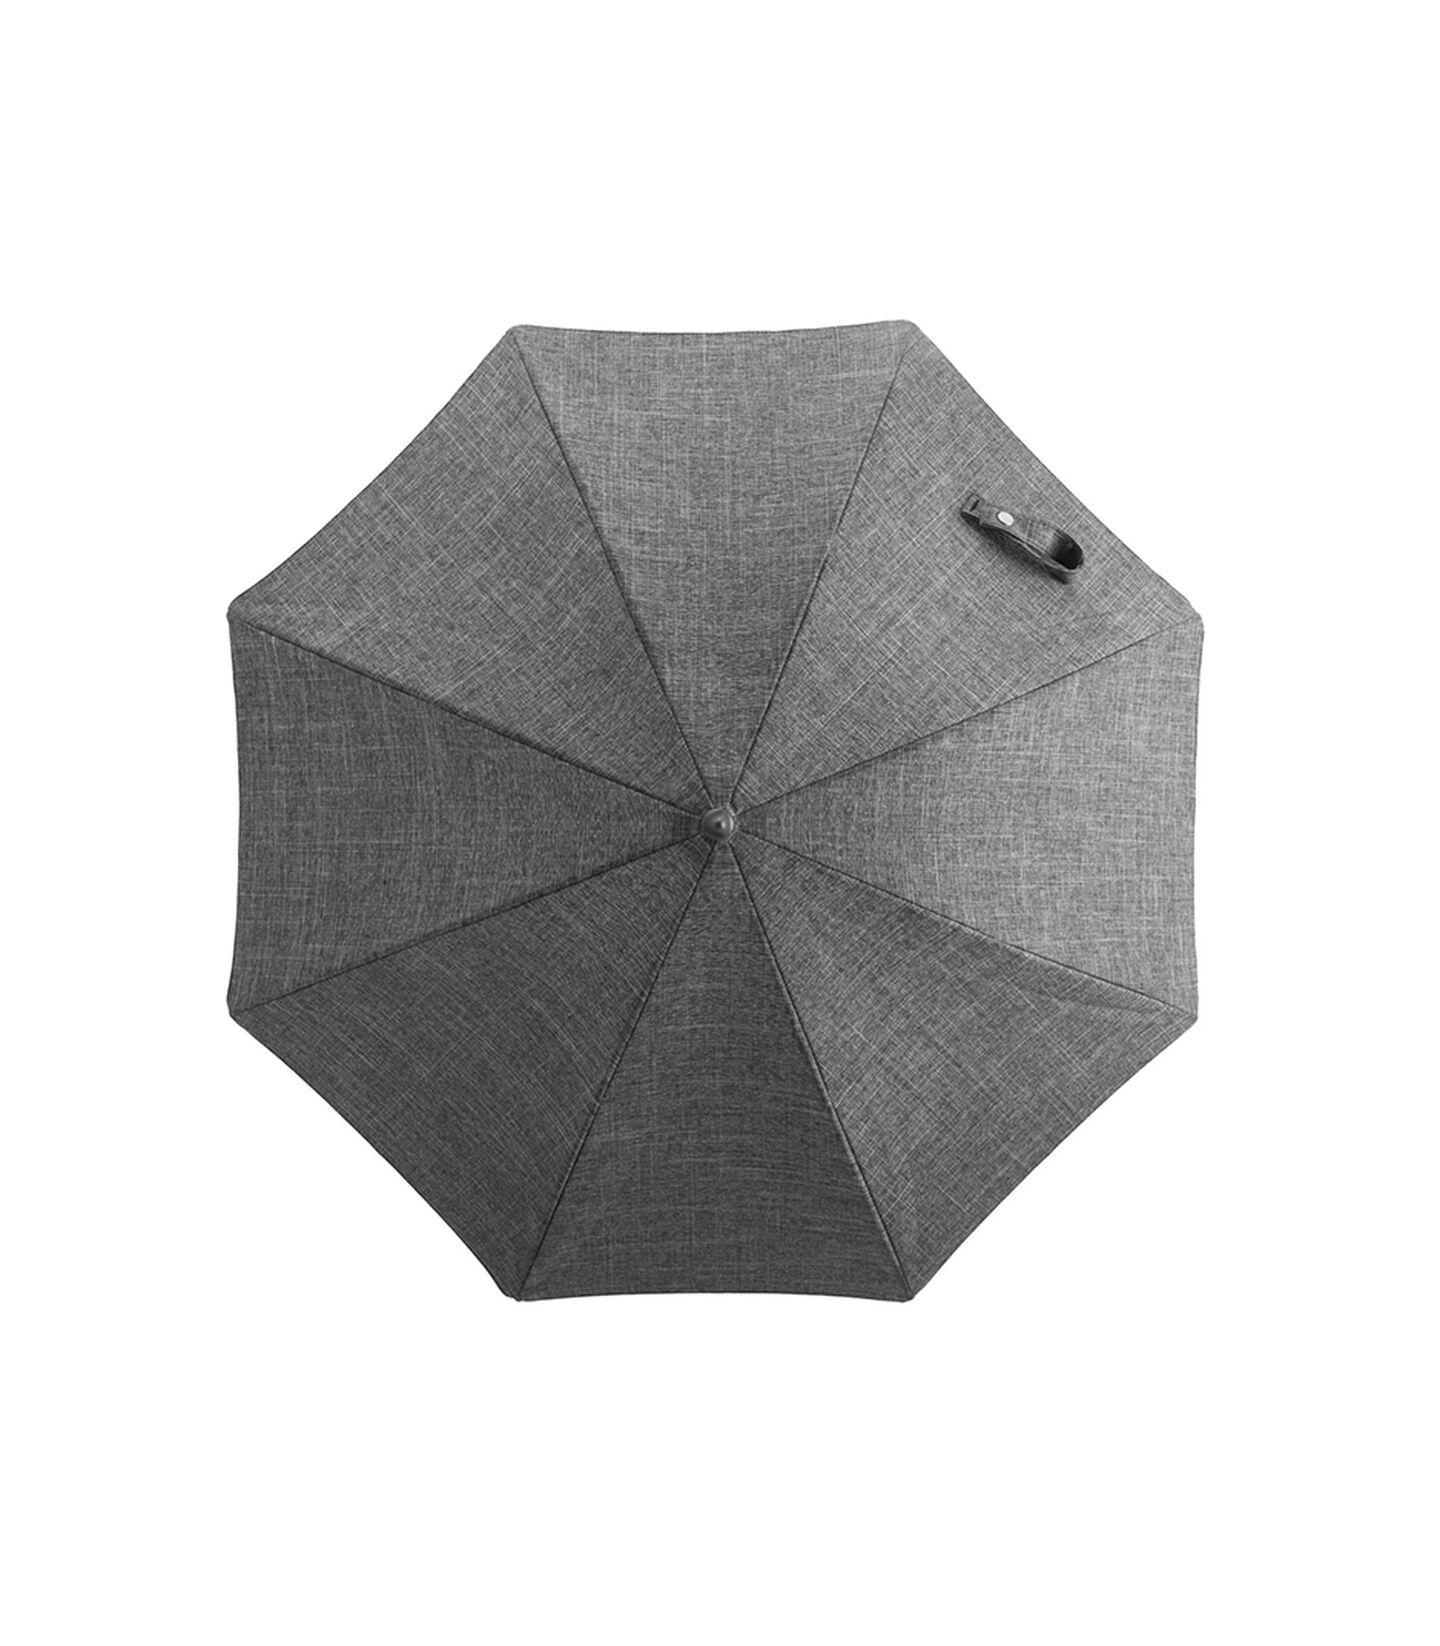 Stokke® Xplory® Black Parasol Black Melange, Black Melange, mainview